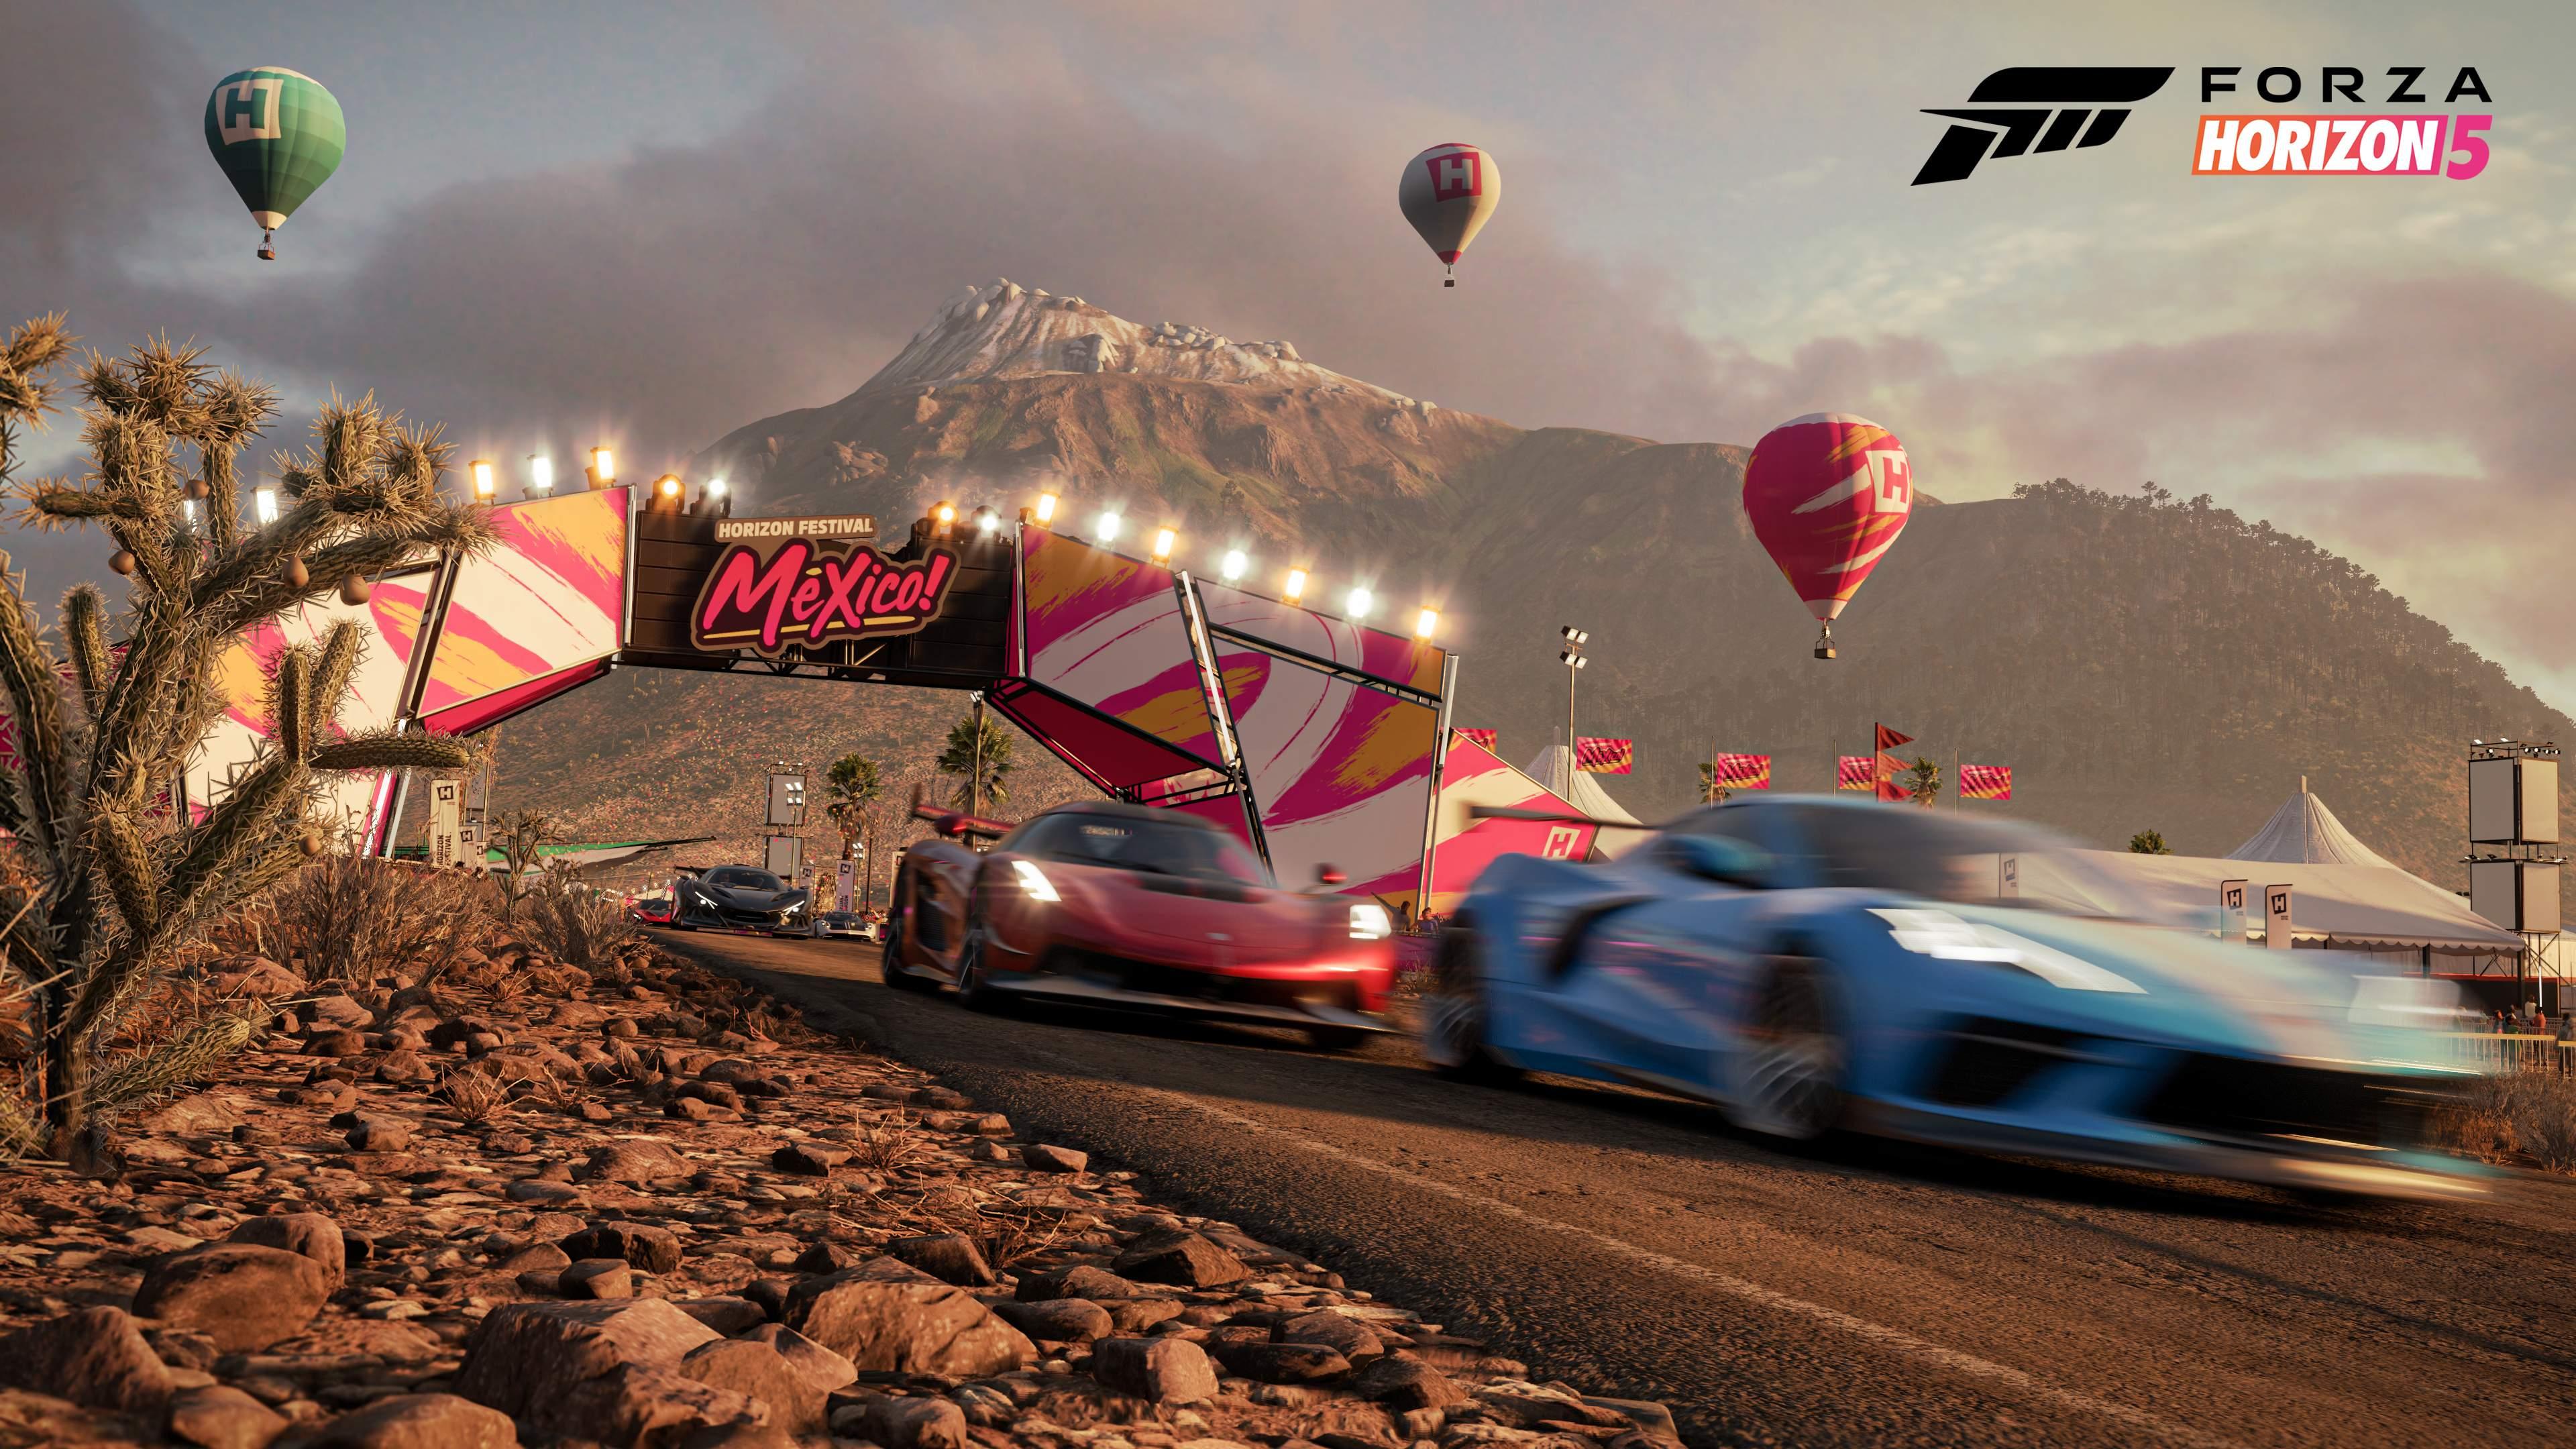 Forza-Horizon5-05-16x9-WM-Festival-Race